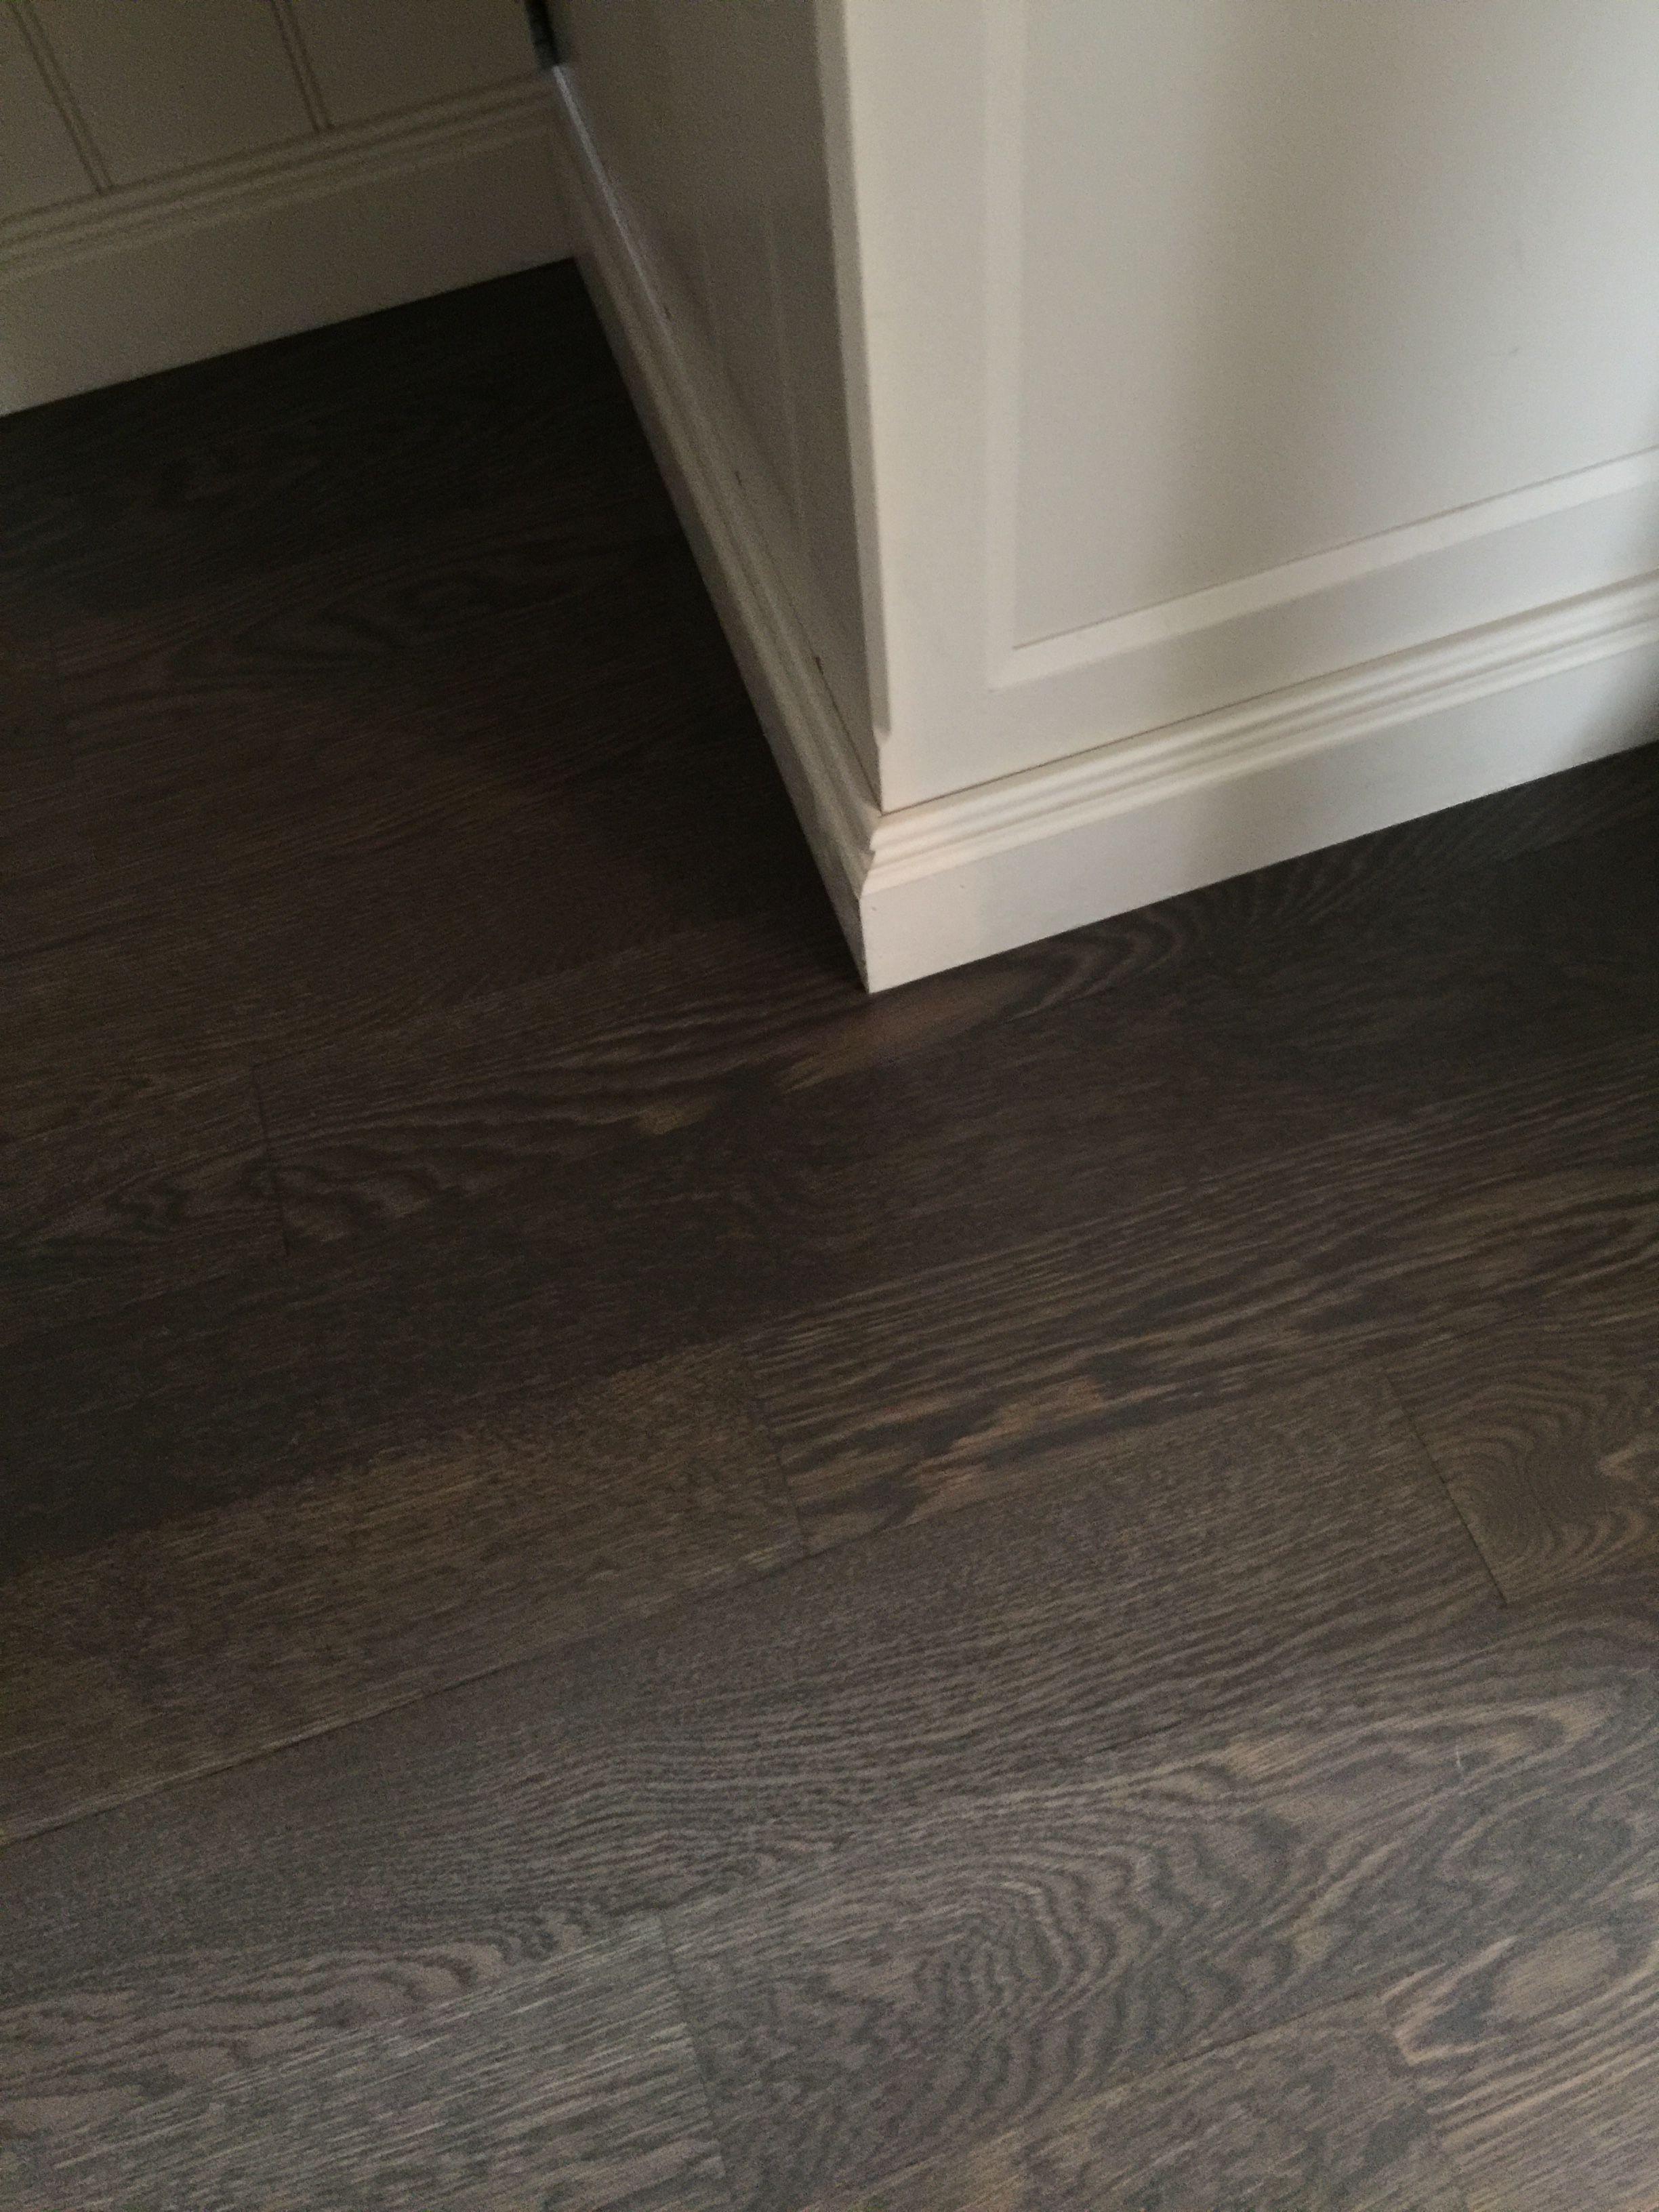 hardwood floor restoration richmond va of hardwood floor refinishing richmond va floor with hardwood floor refinishing richmond va 4 white oak hardwood floor stain classic grey and